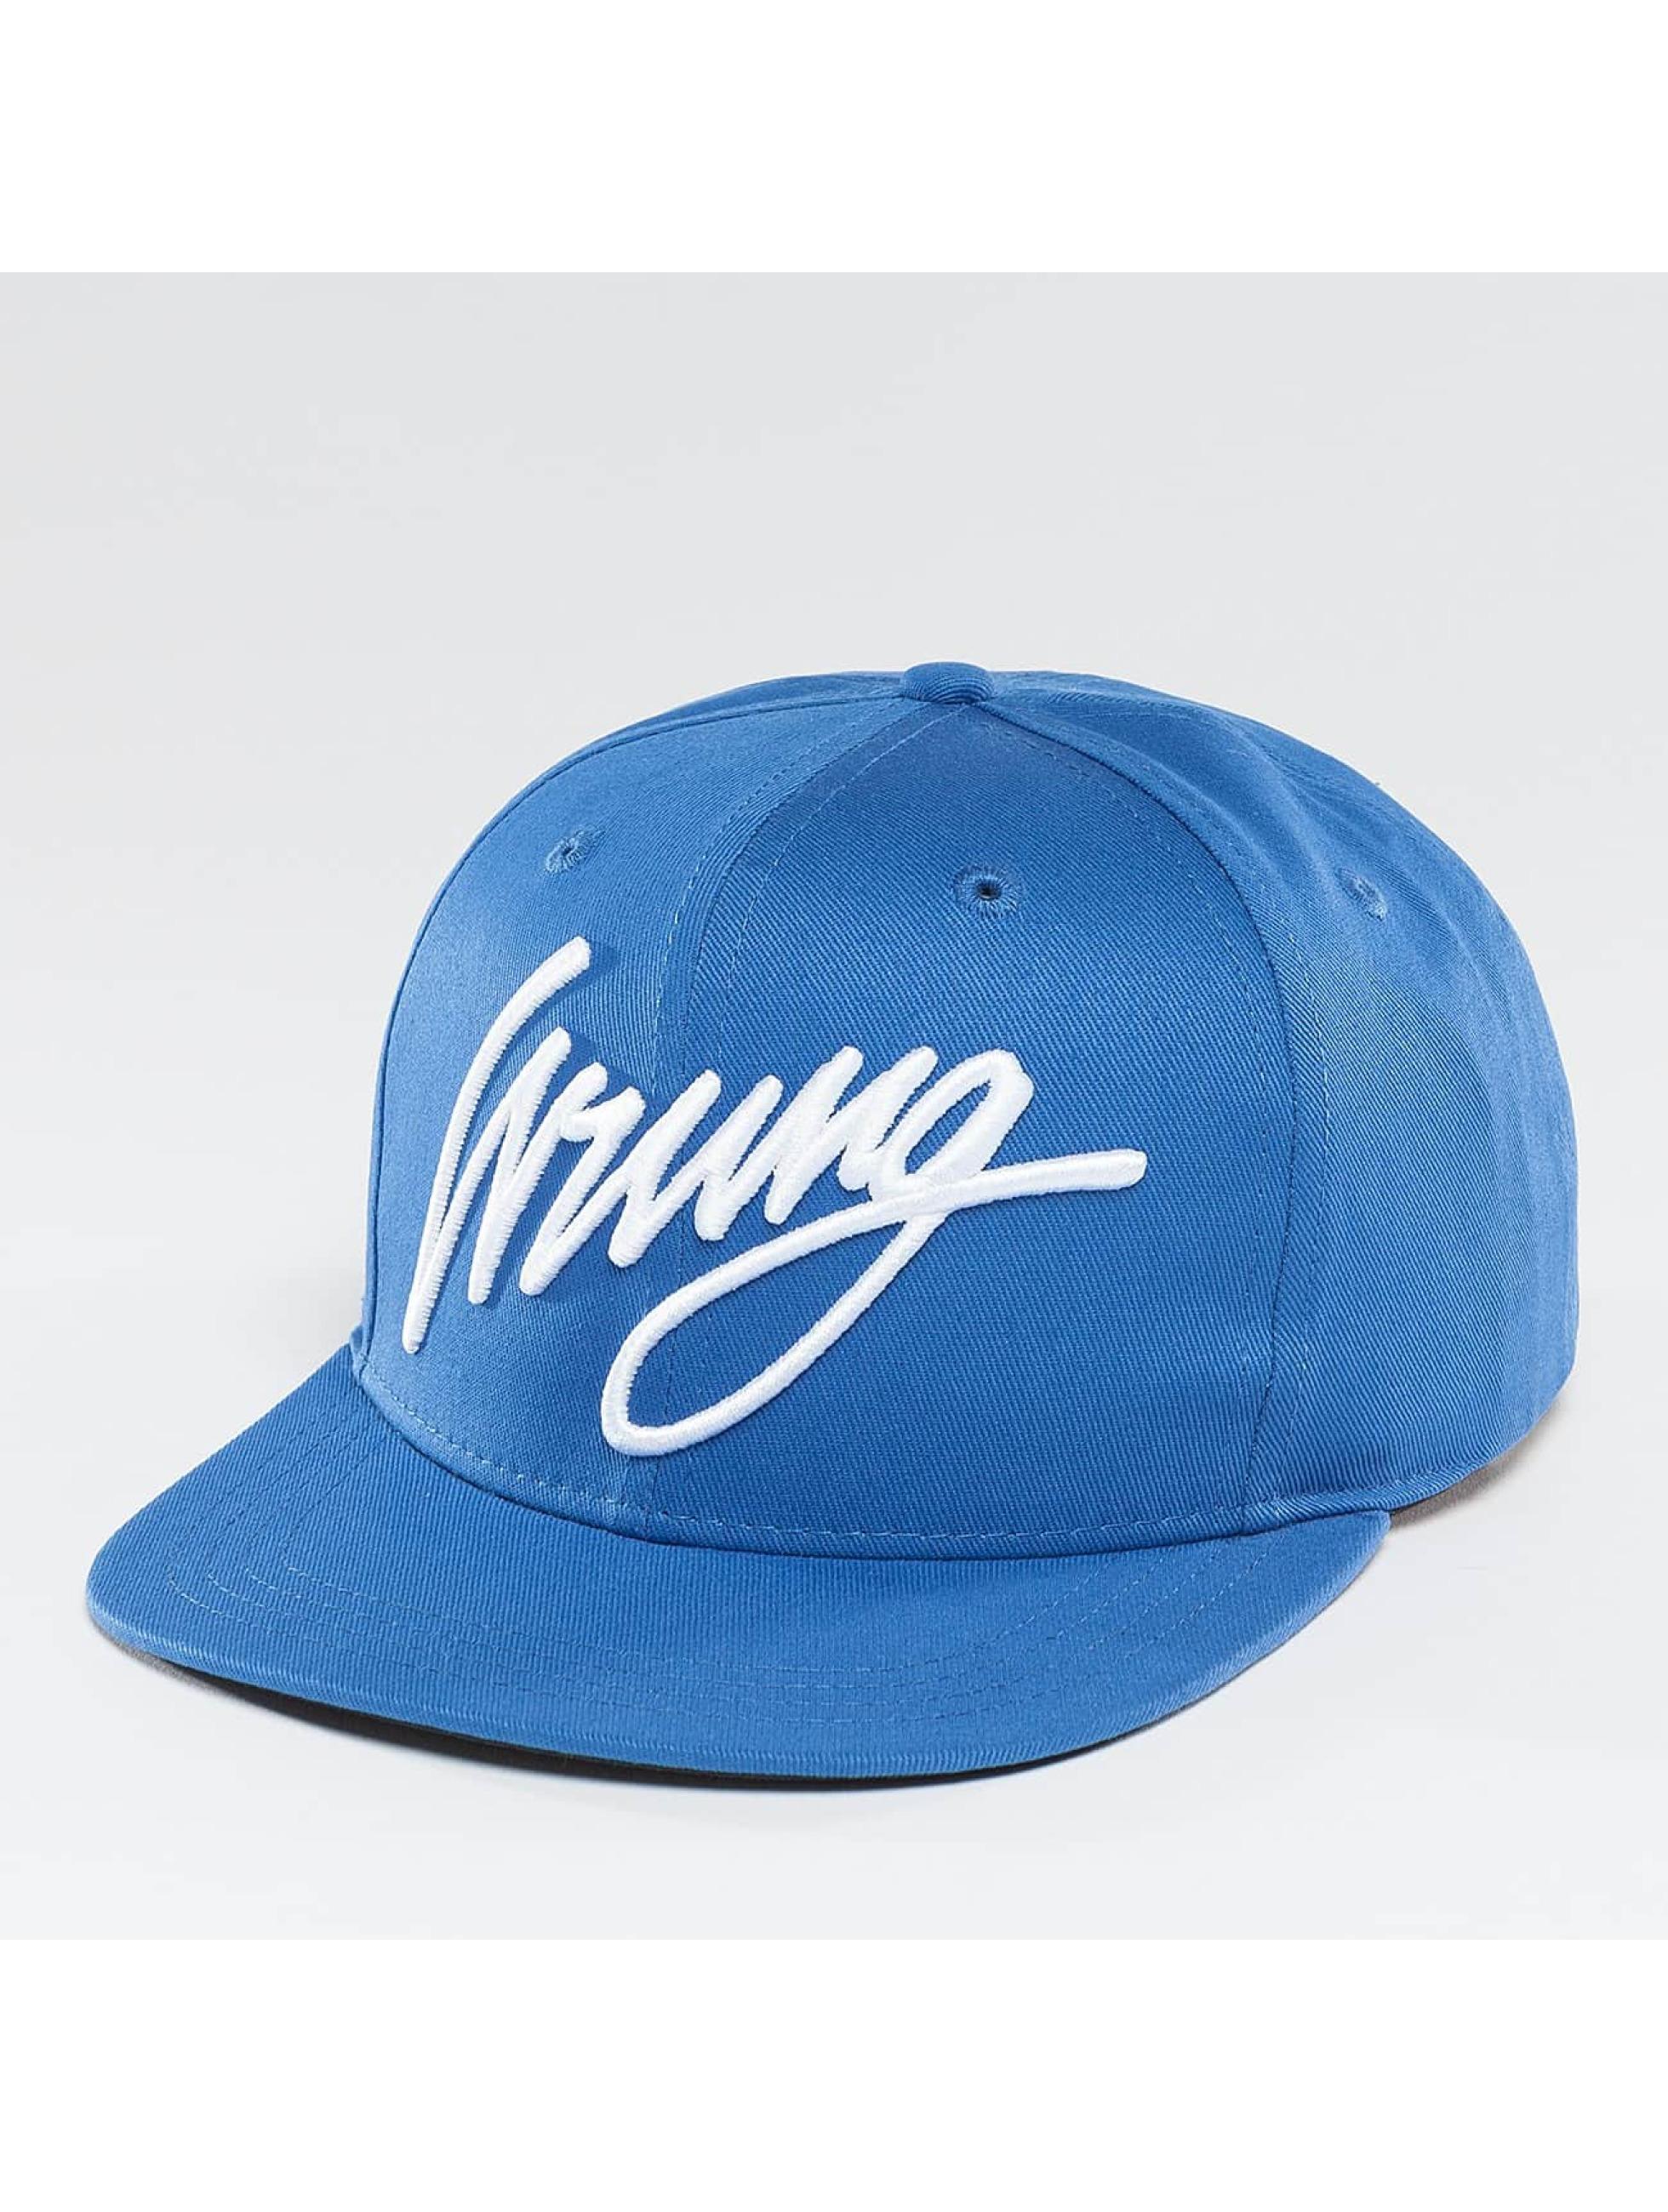 Wrung Division Männer,Frauen Snapback Cap Sigle in blau